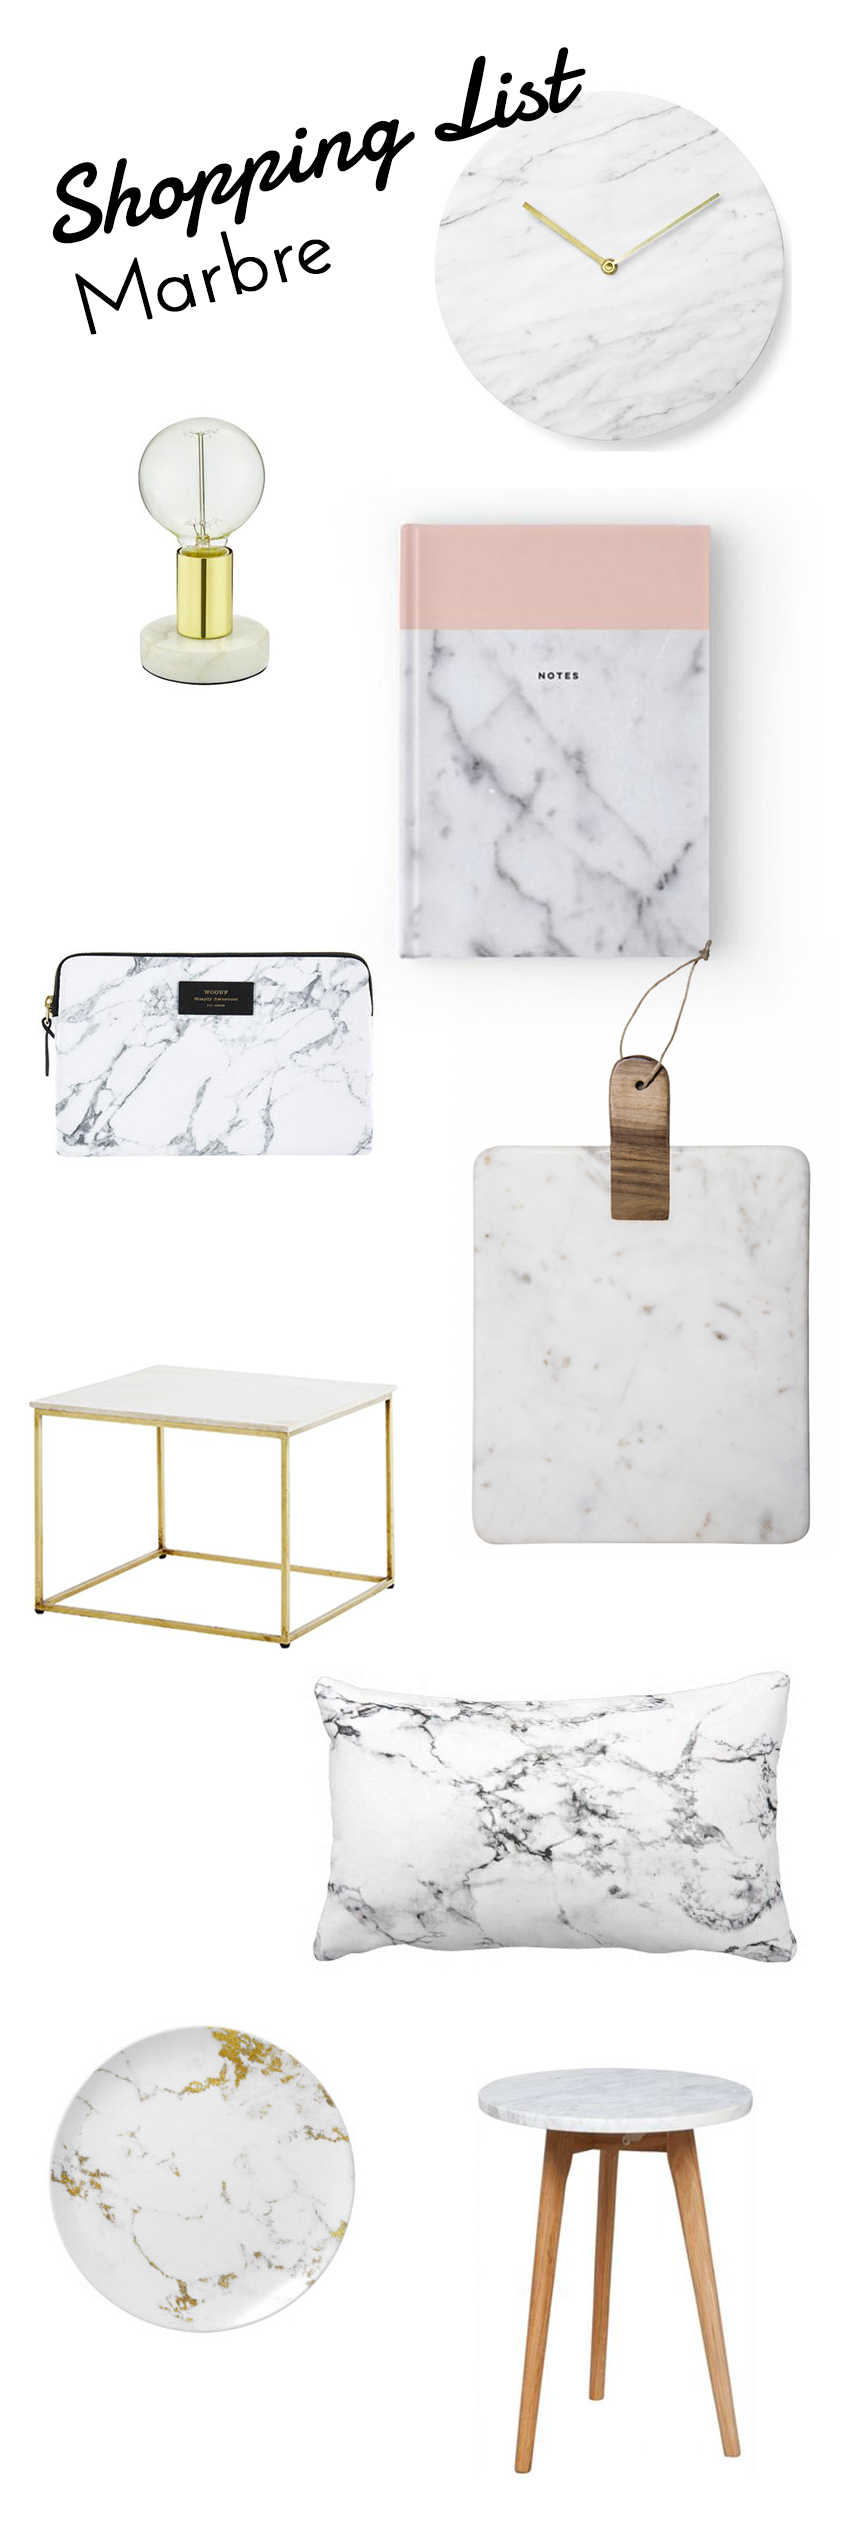 shopping-list-marbre-mademoiselle-claudine-